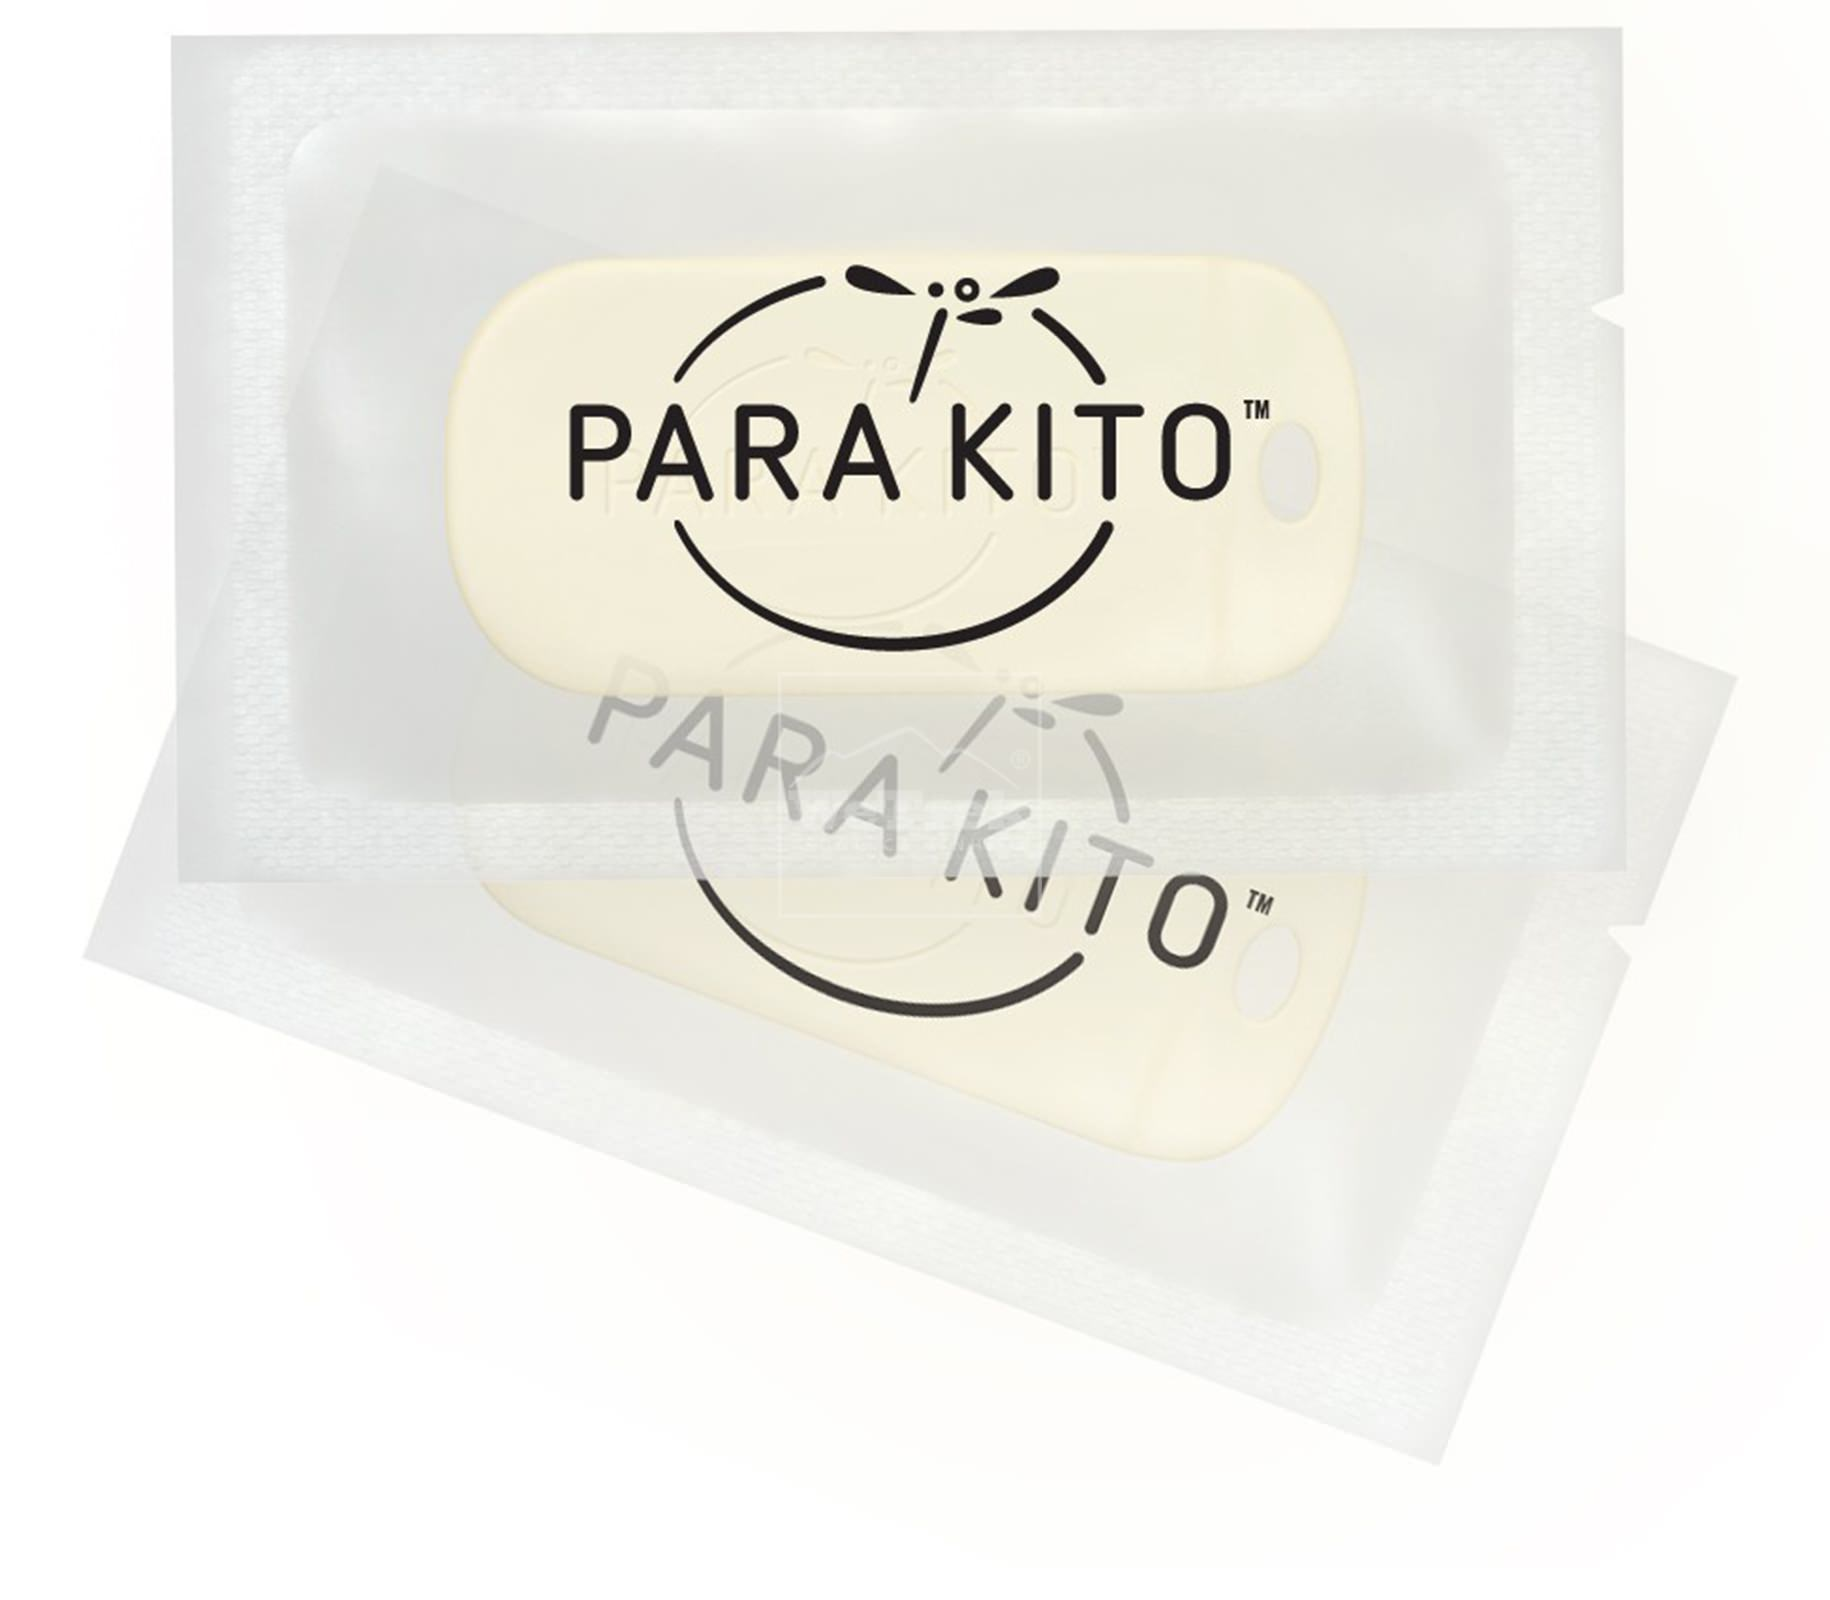 sap-chong-muoi-kem-vong-tay-tre-em-parakito-be-cool-kids-band-7500-wetrek.vn-4